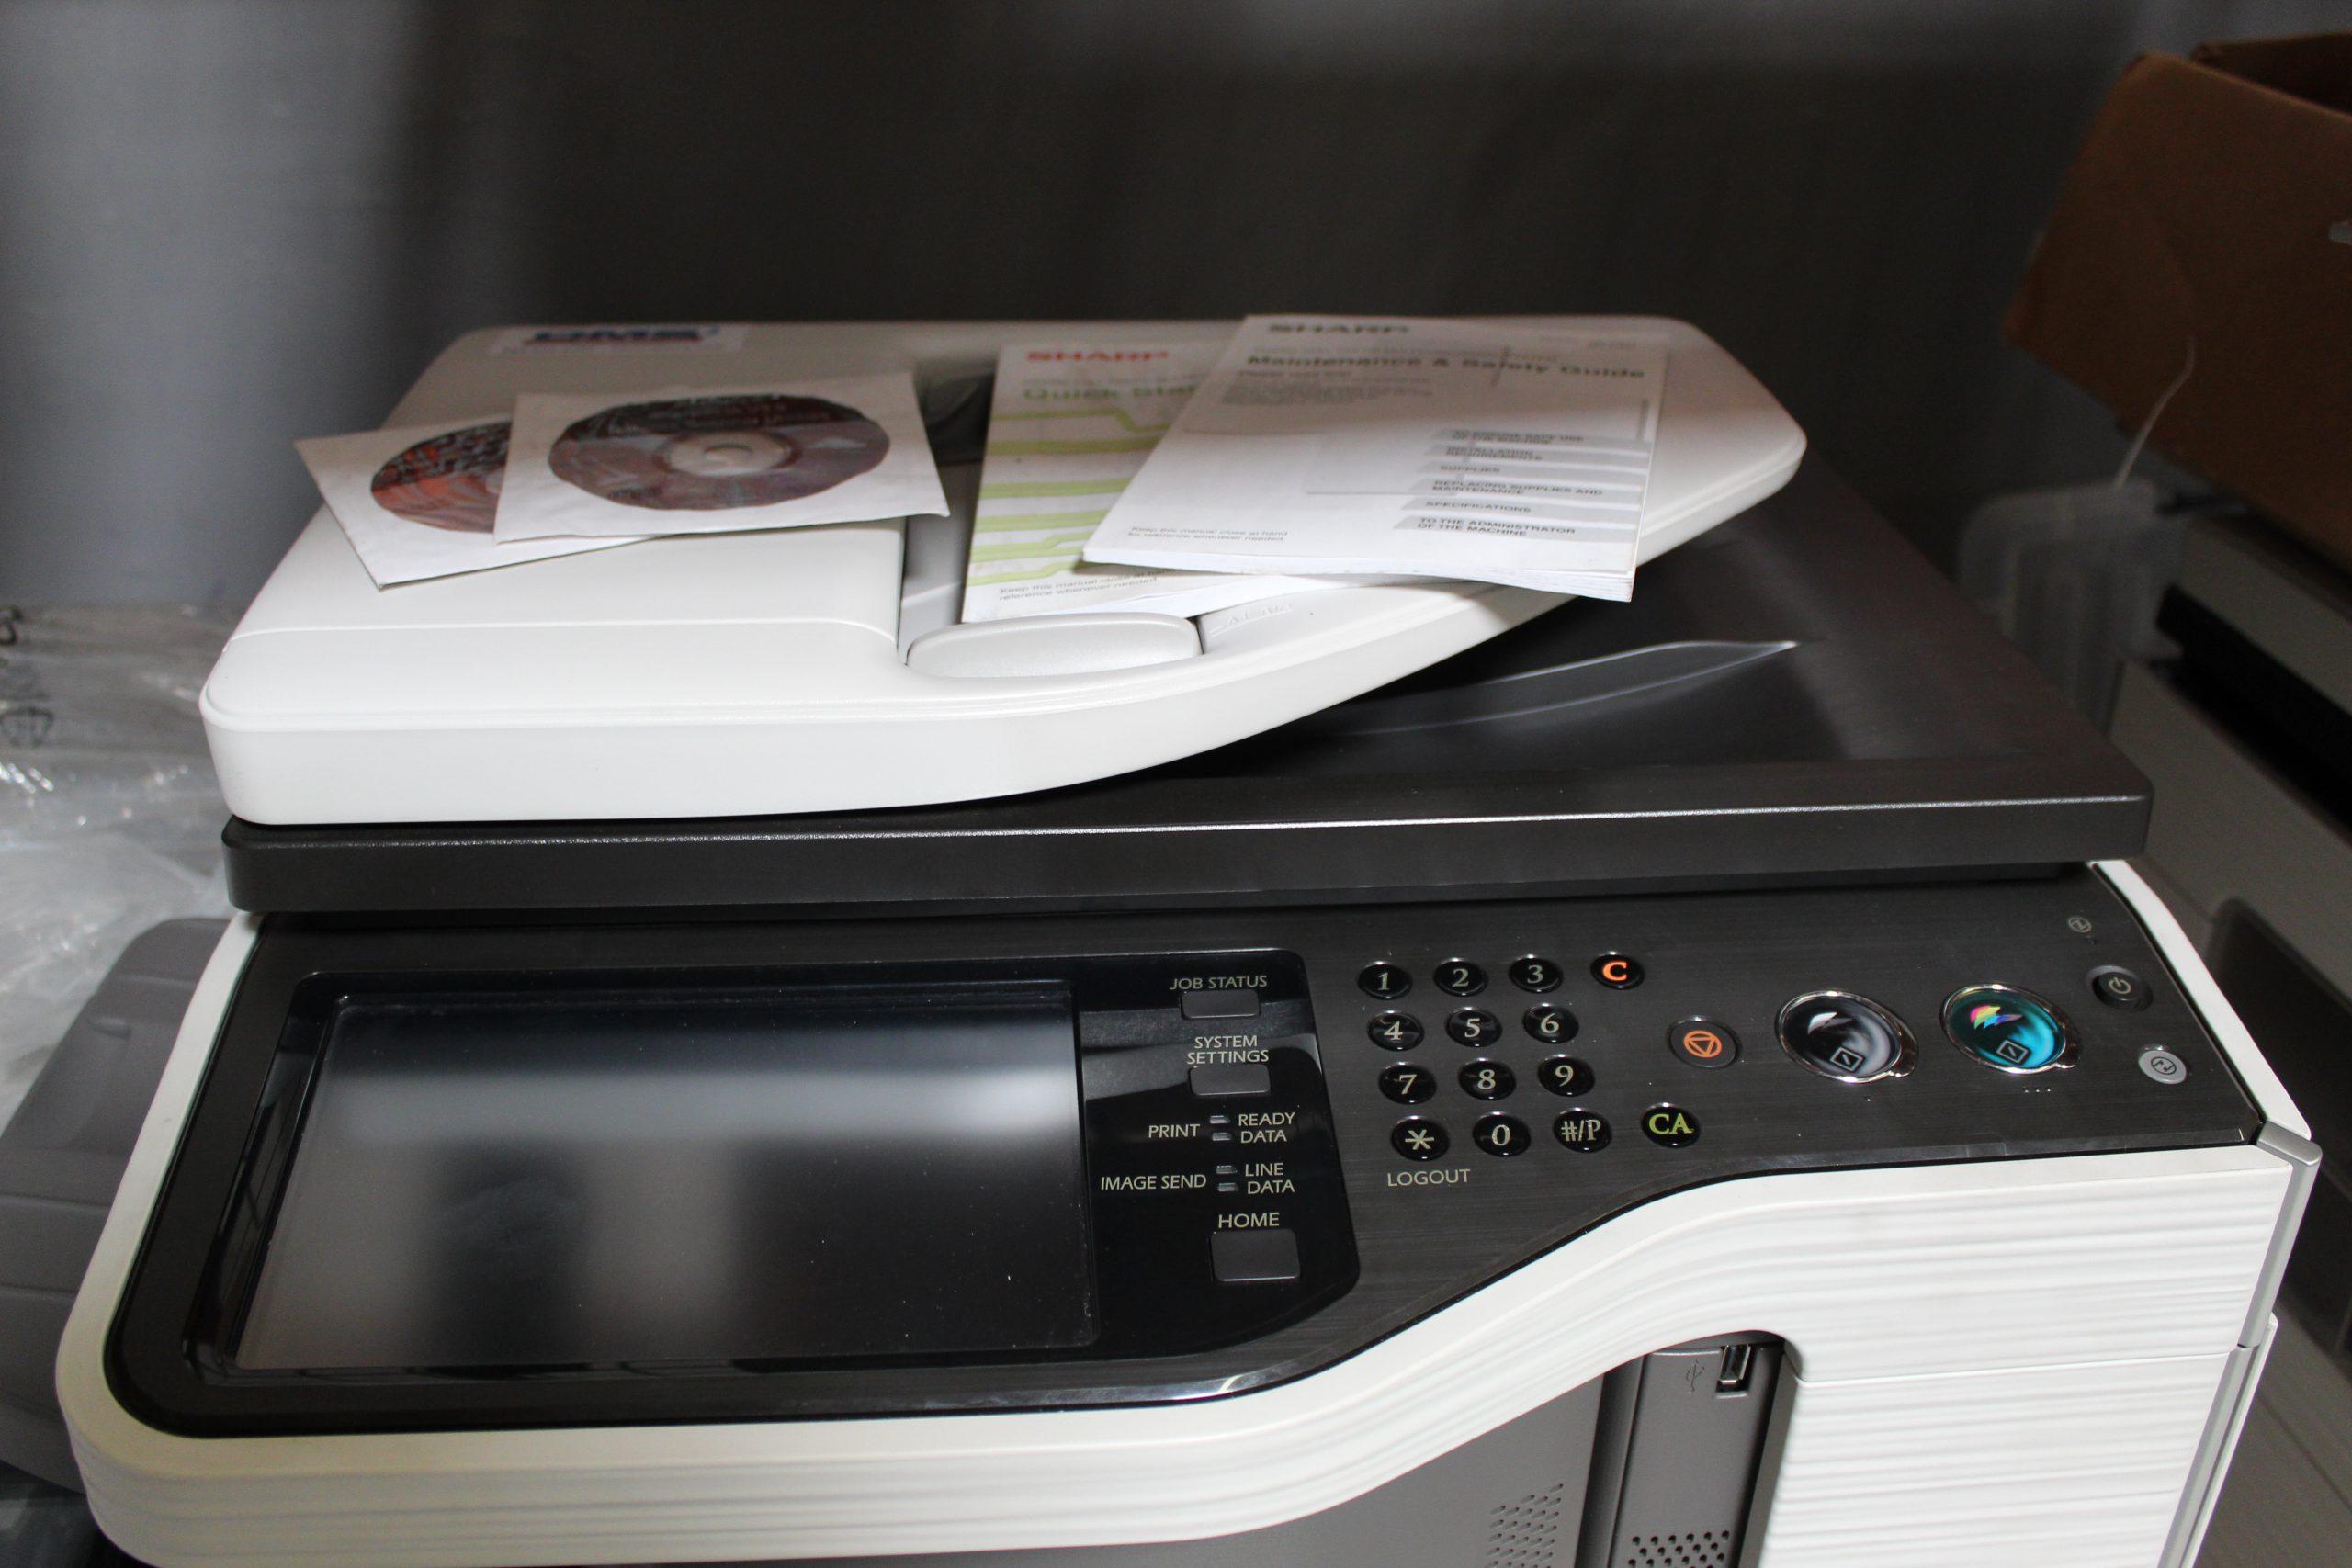 Used Copy Machines